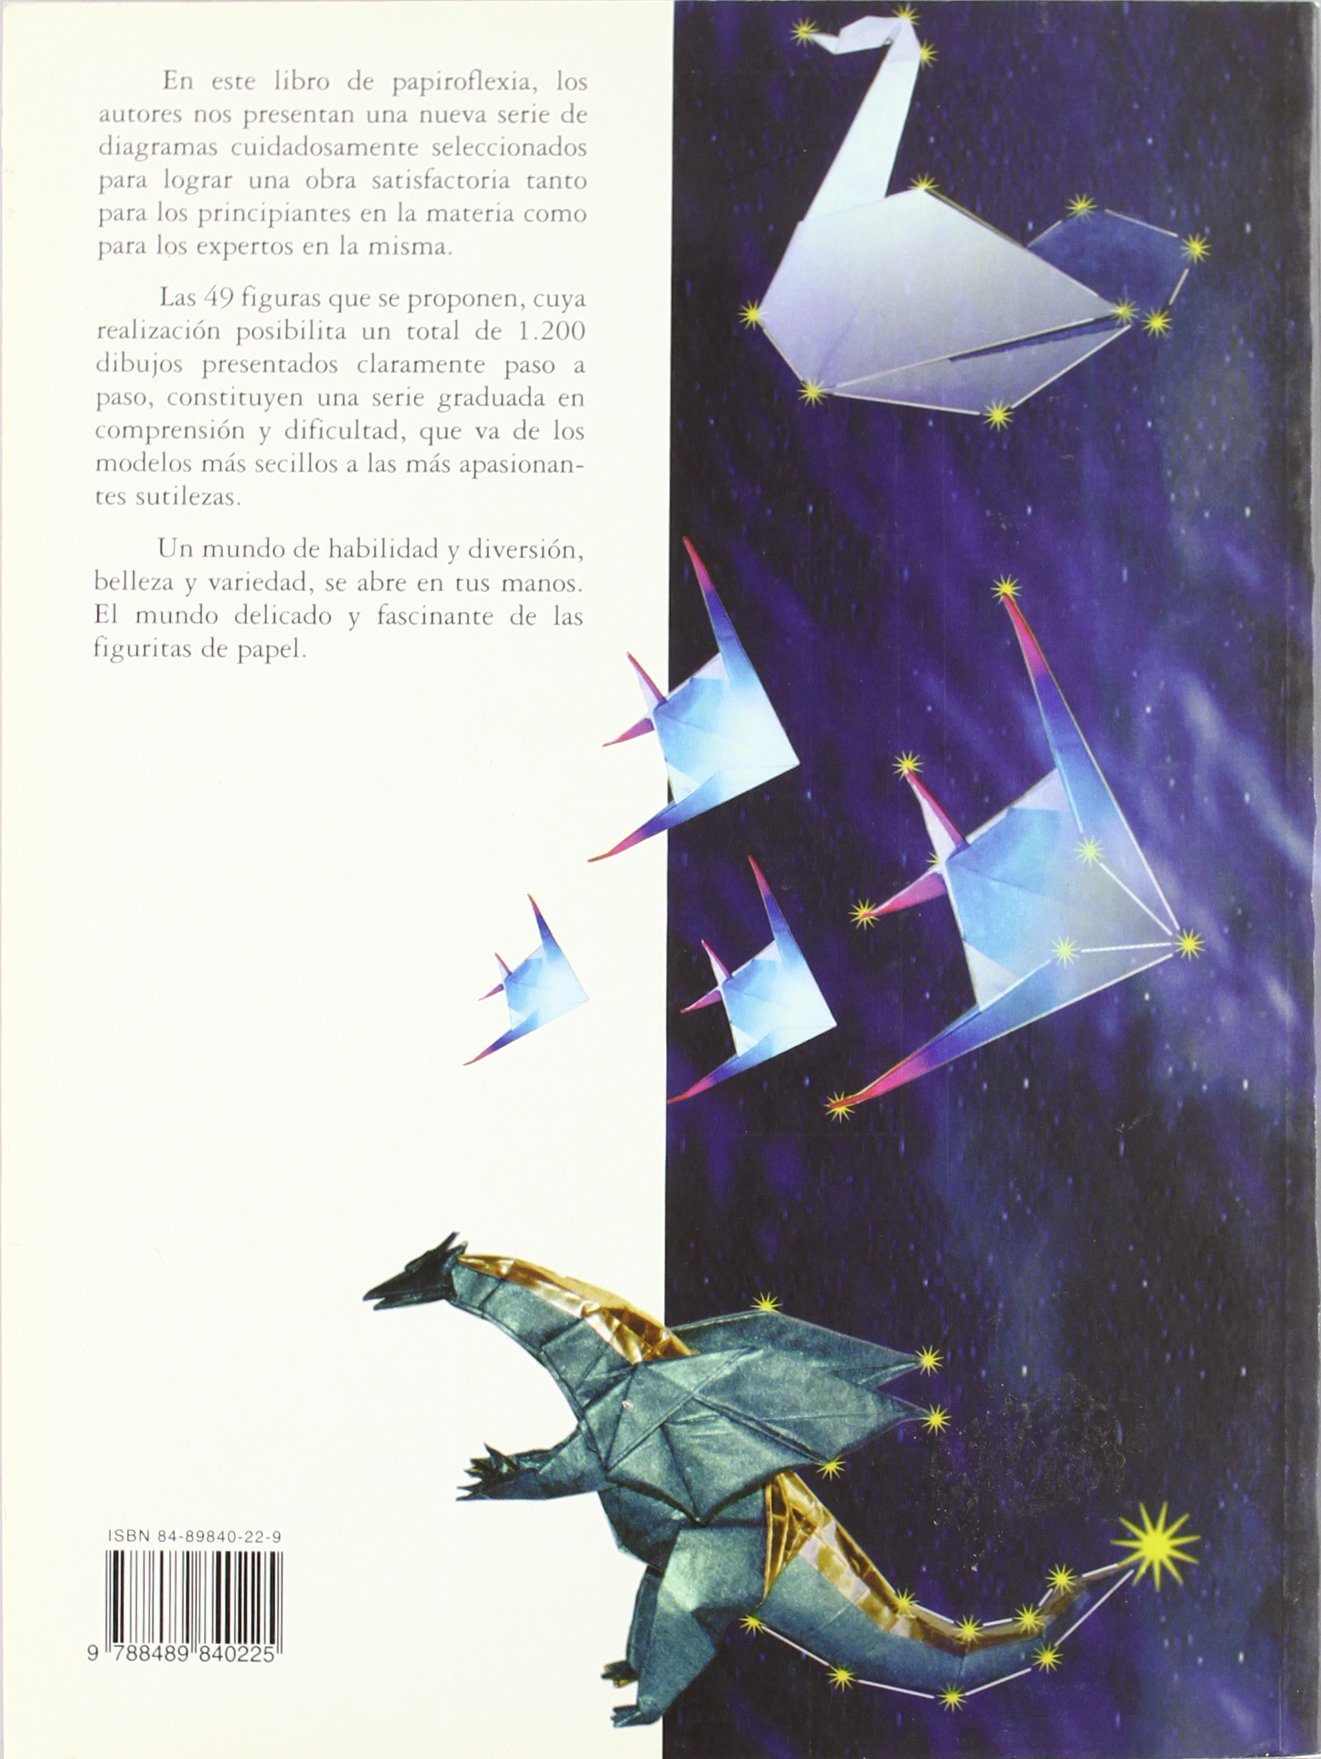 Fantasias de papel / Paper Fantasies: Lo facil y lo dificil de la papiroflexia / The easy and the difficult thing of origami (Viajes) (Spanish Edition): ...